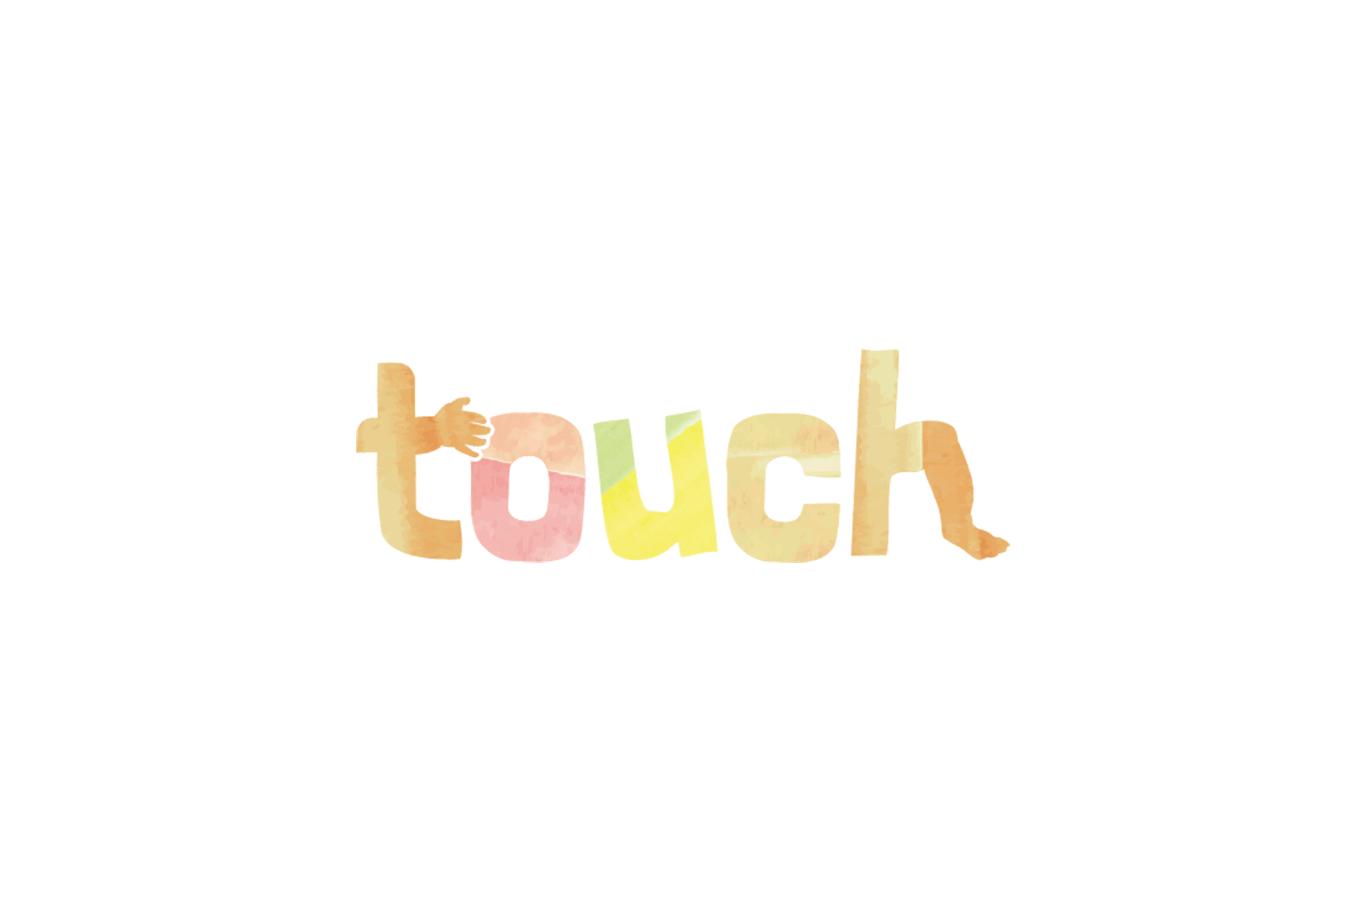 touchweb